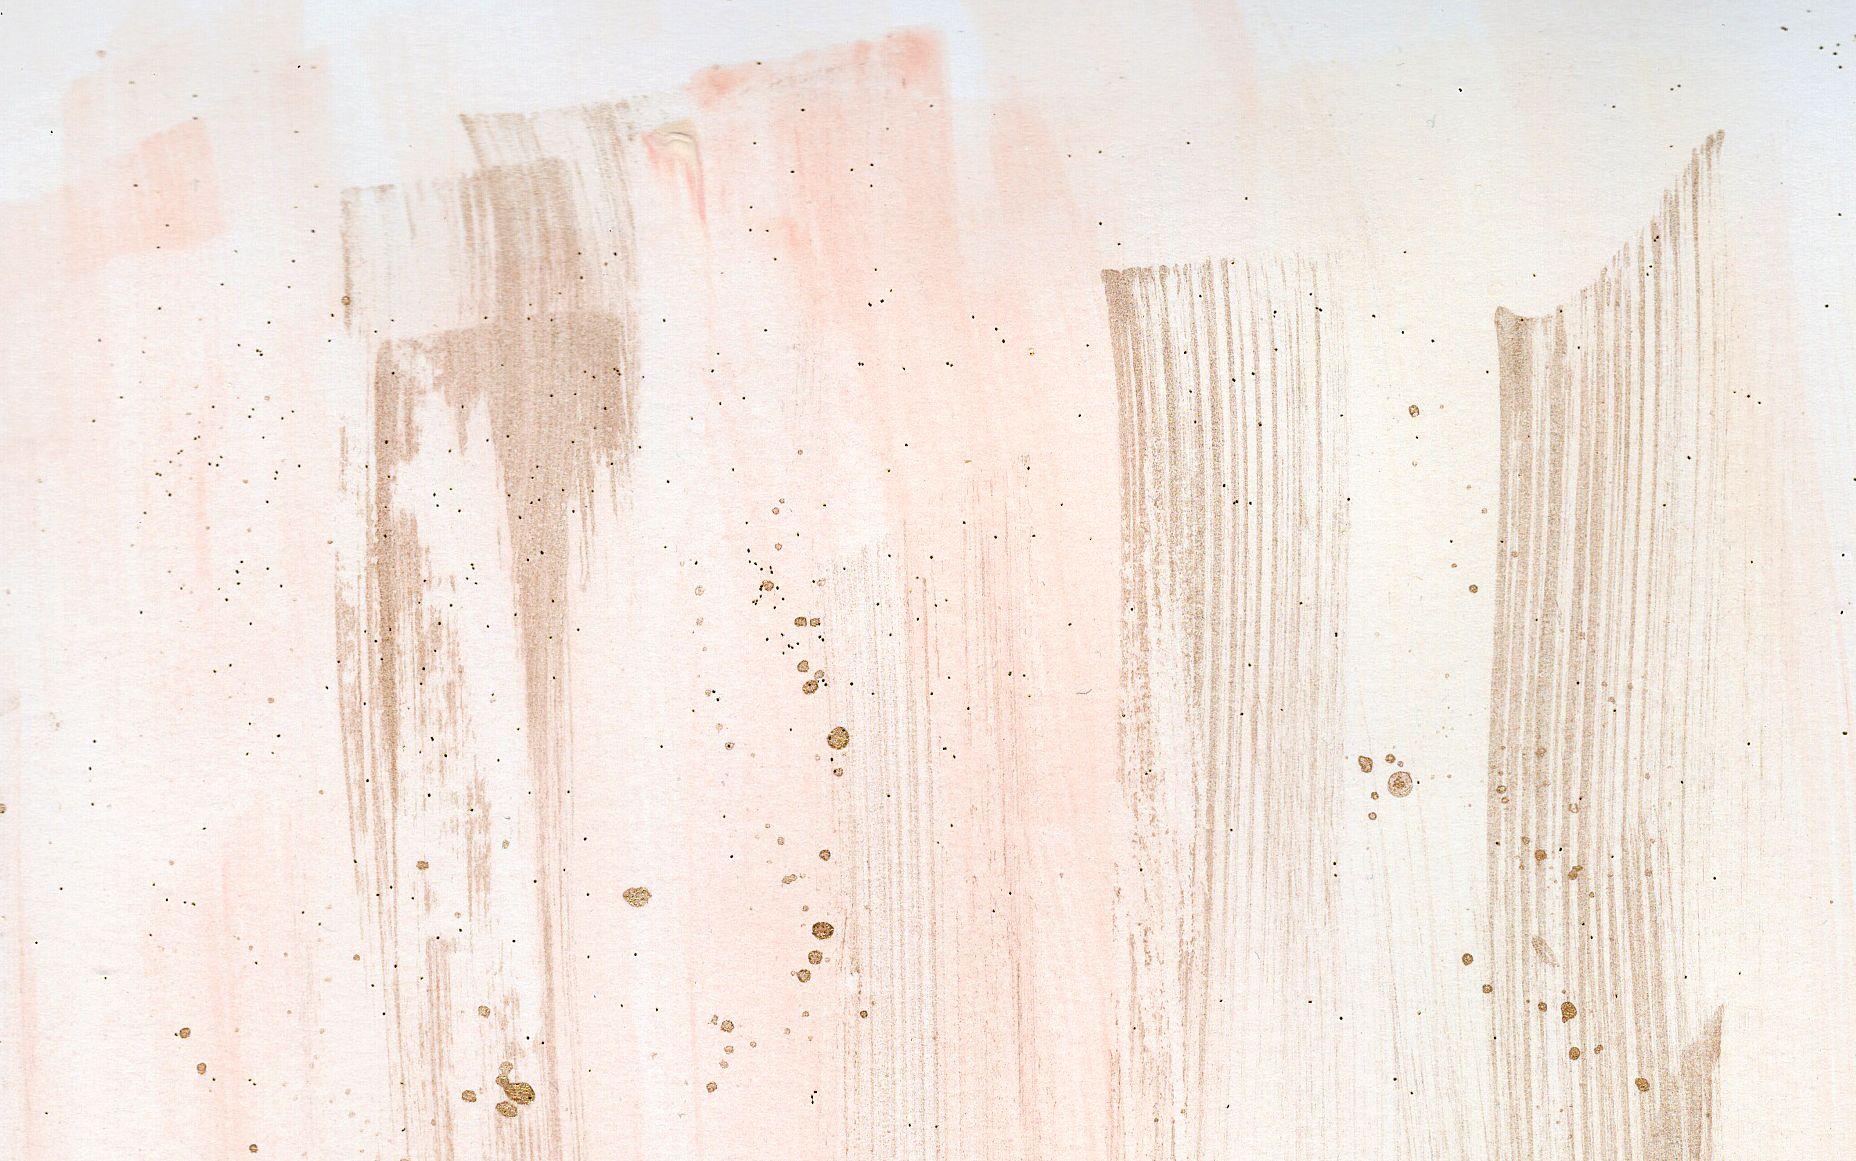 Watercolour coral blush gold brushstroke desktop wallpaper background